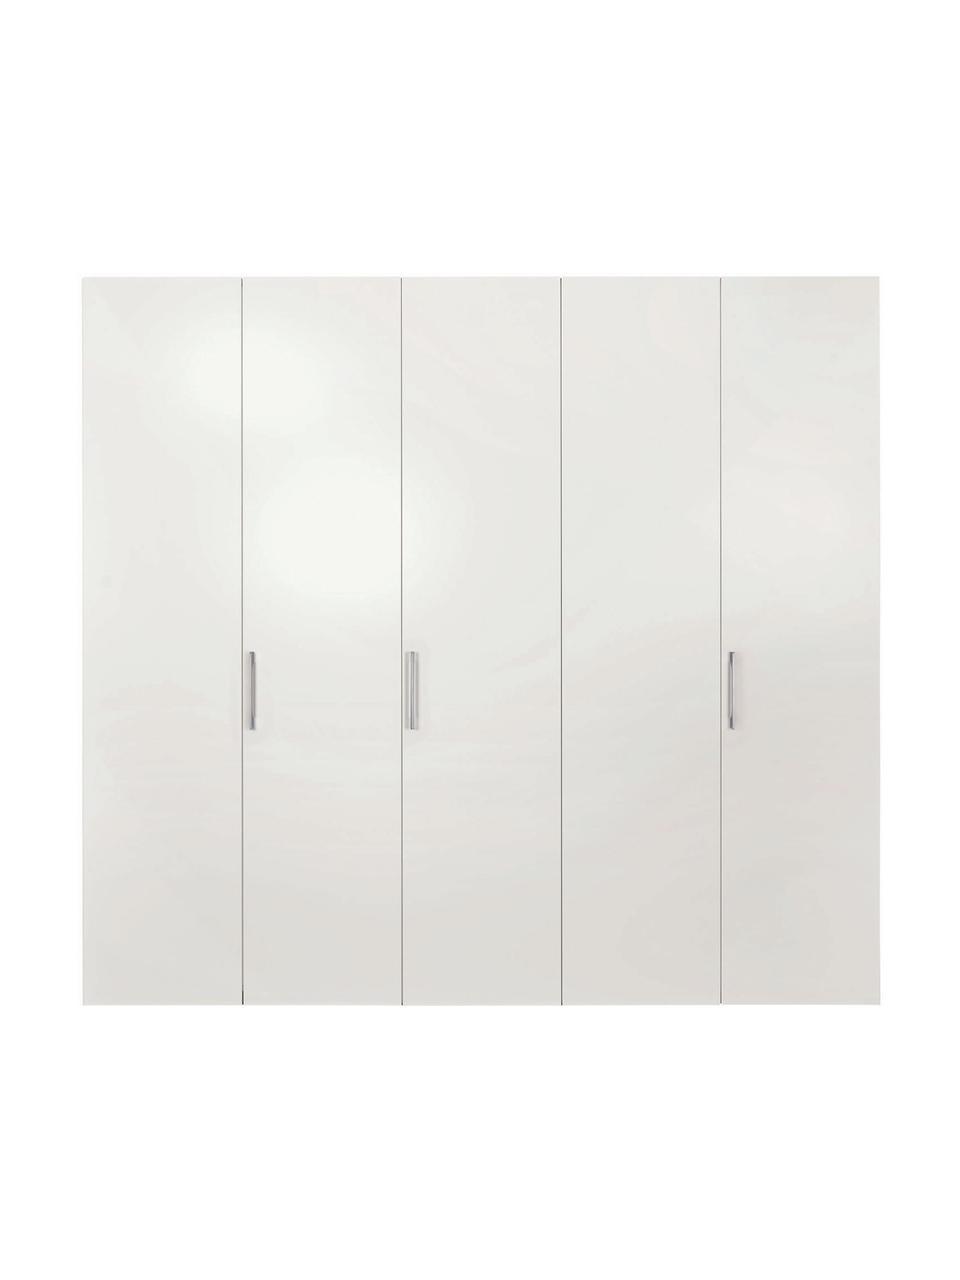 Witte kledingkast Madison, Frame: panelen op houtbasis, gel, Wit, 252 x 230 cm